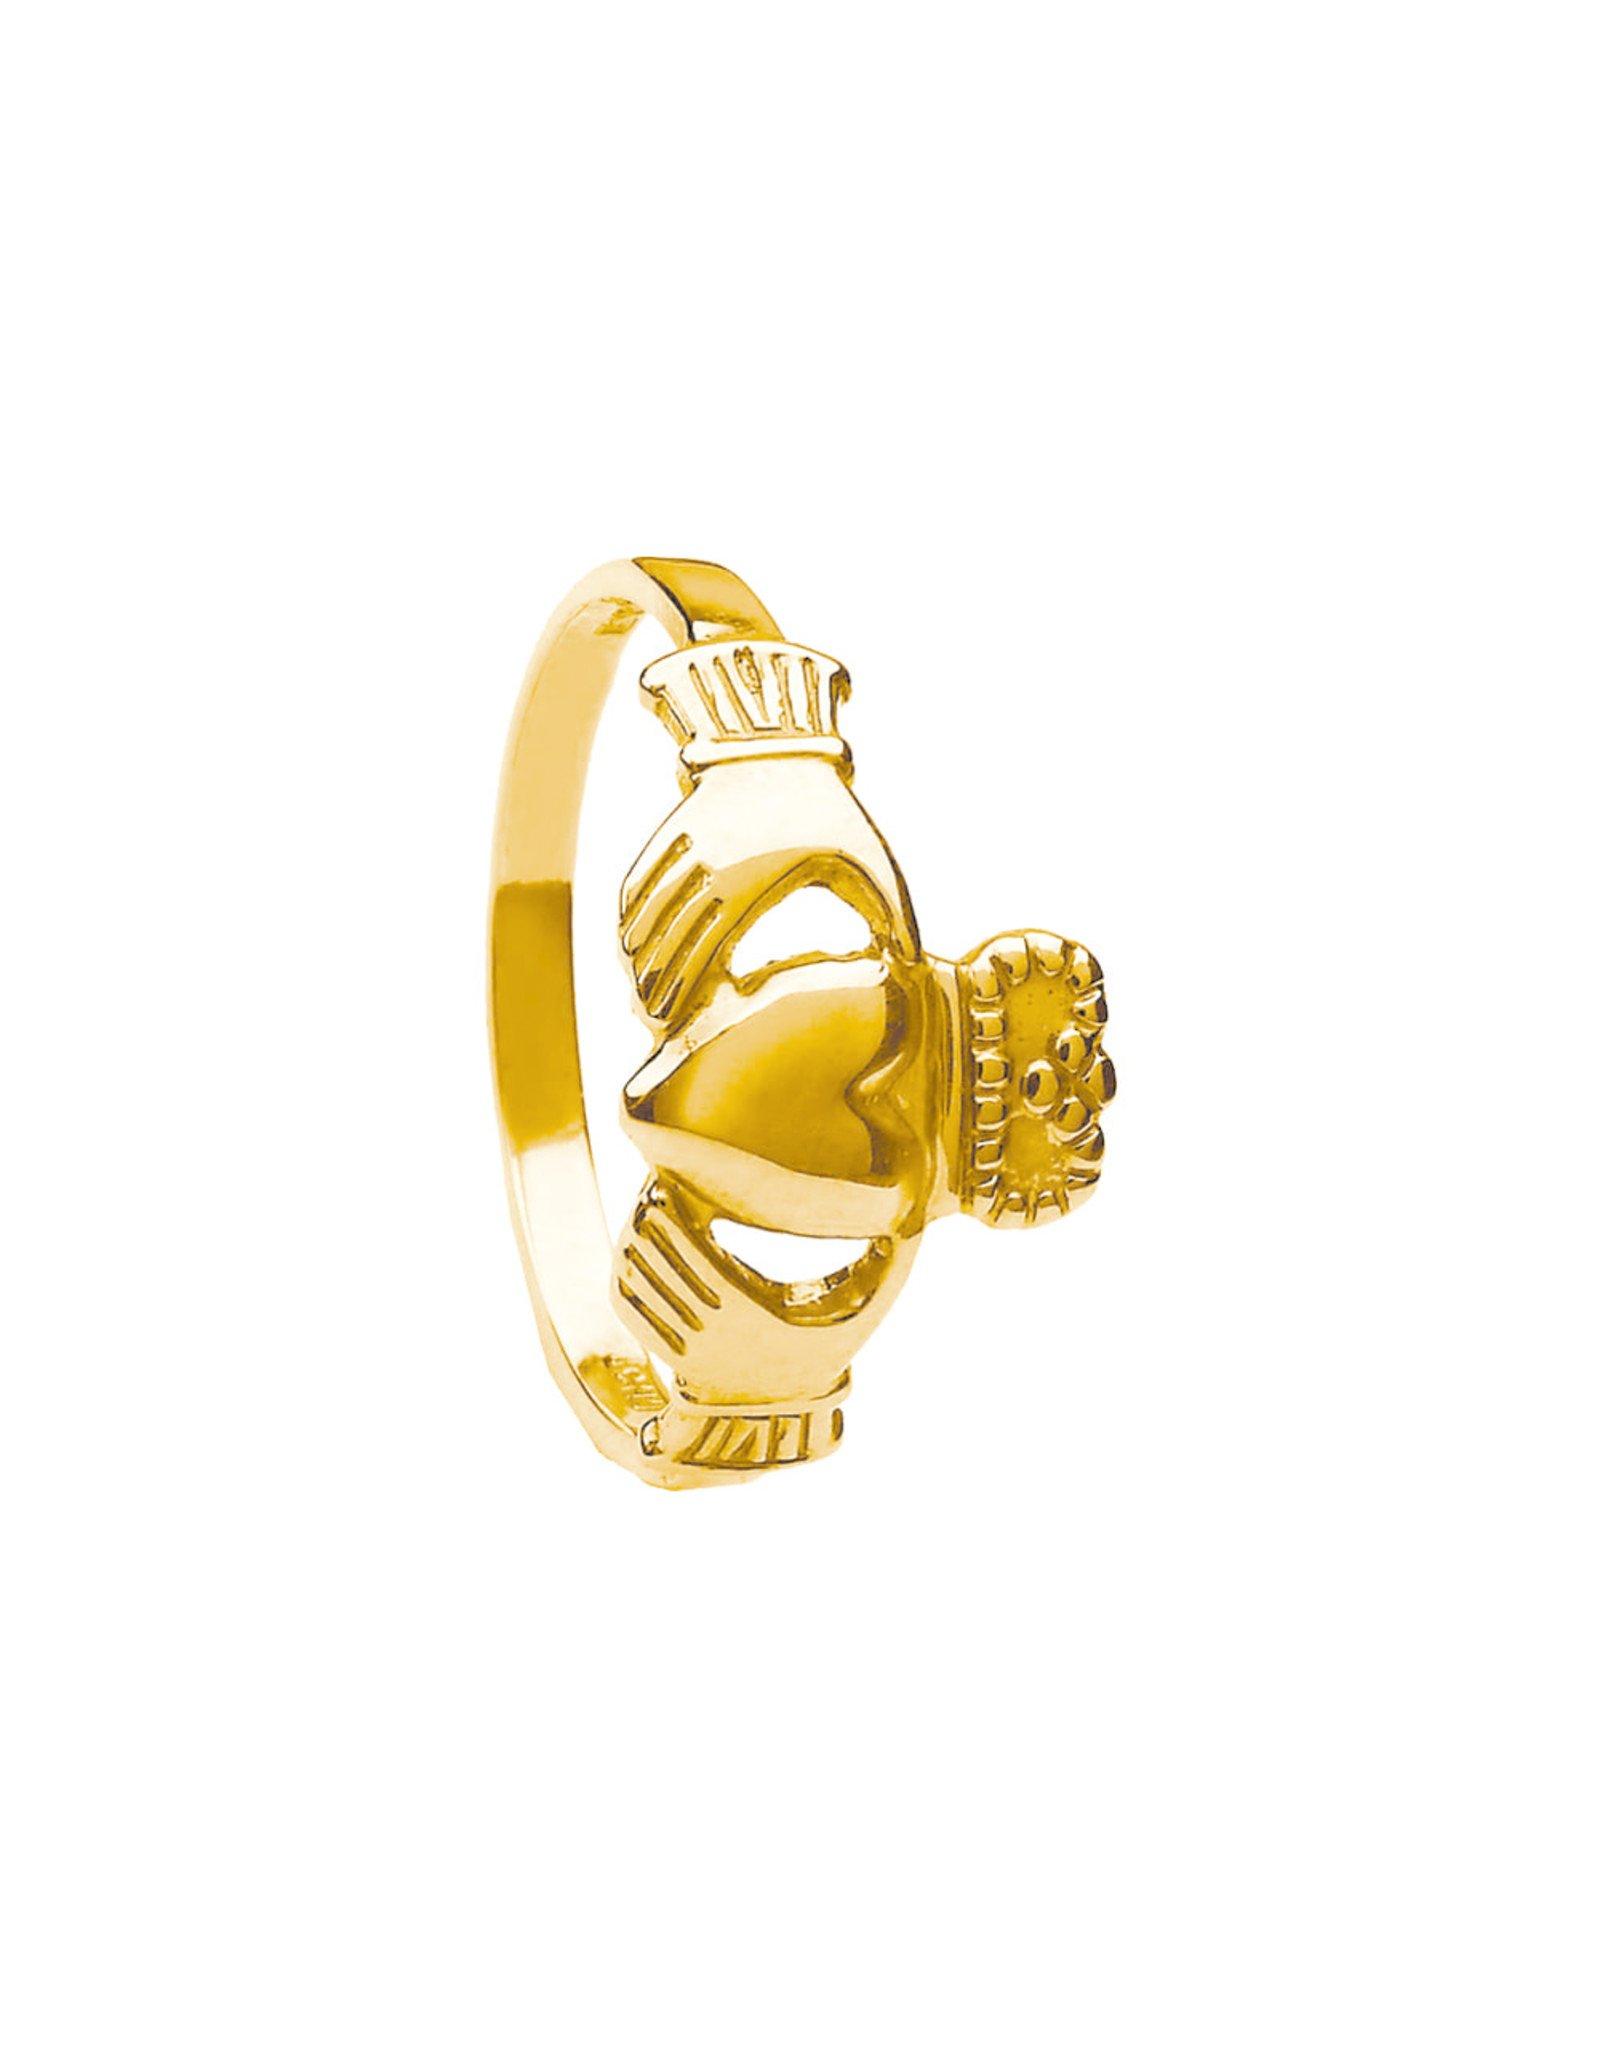 Boru Jewelry 10k Gold Claddagh Ring by Boru